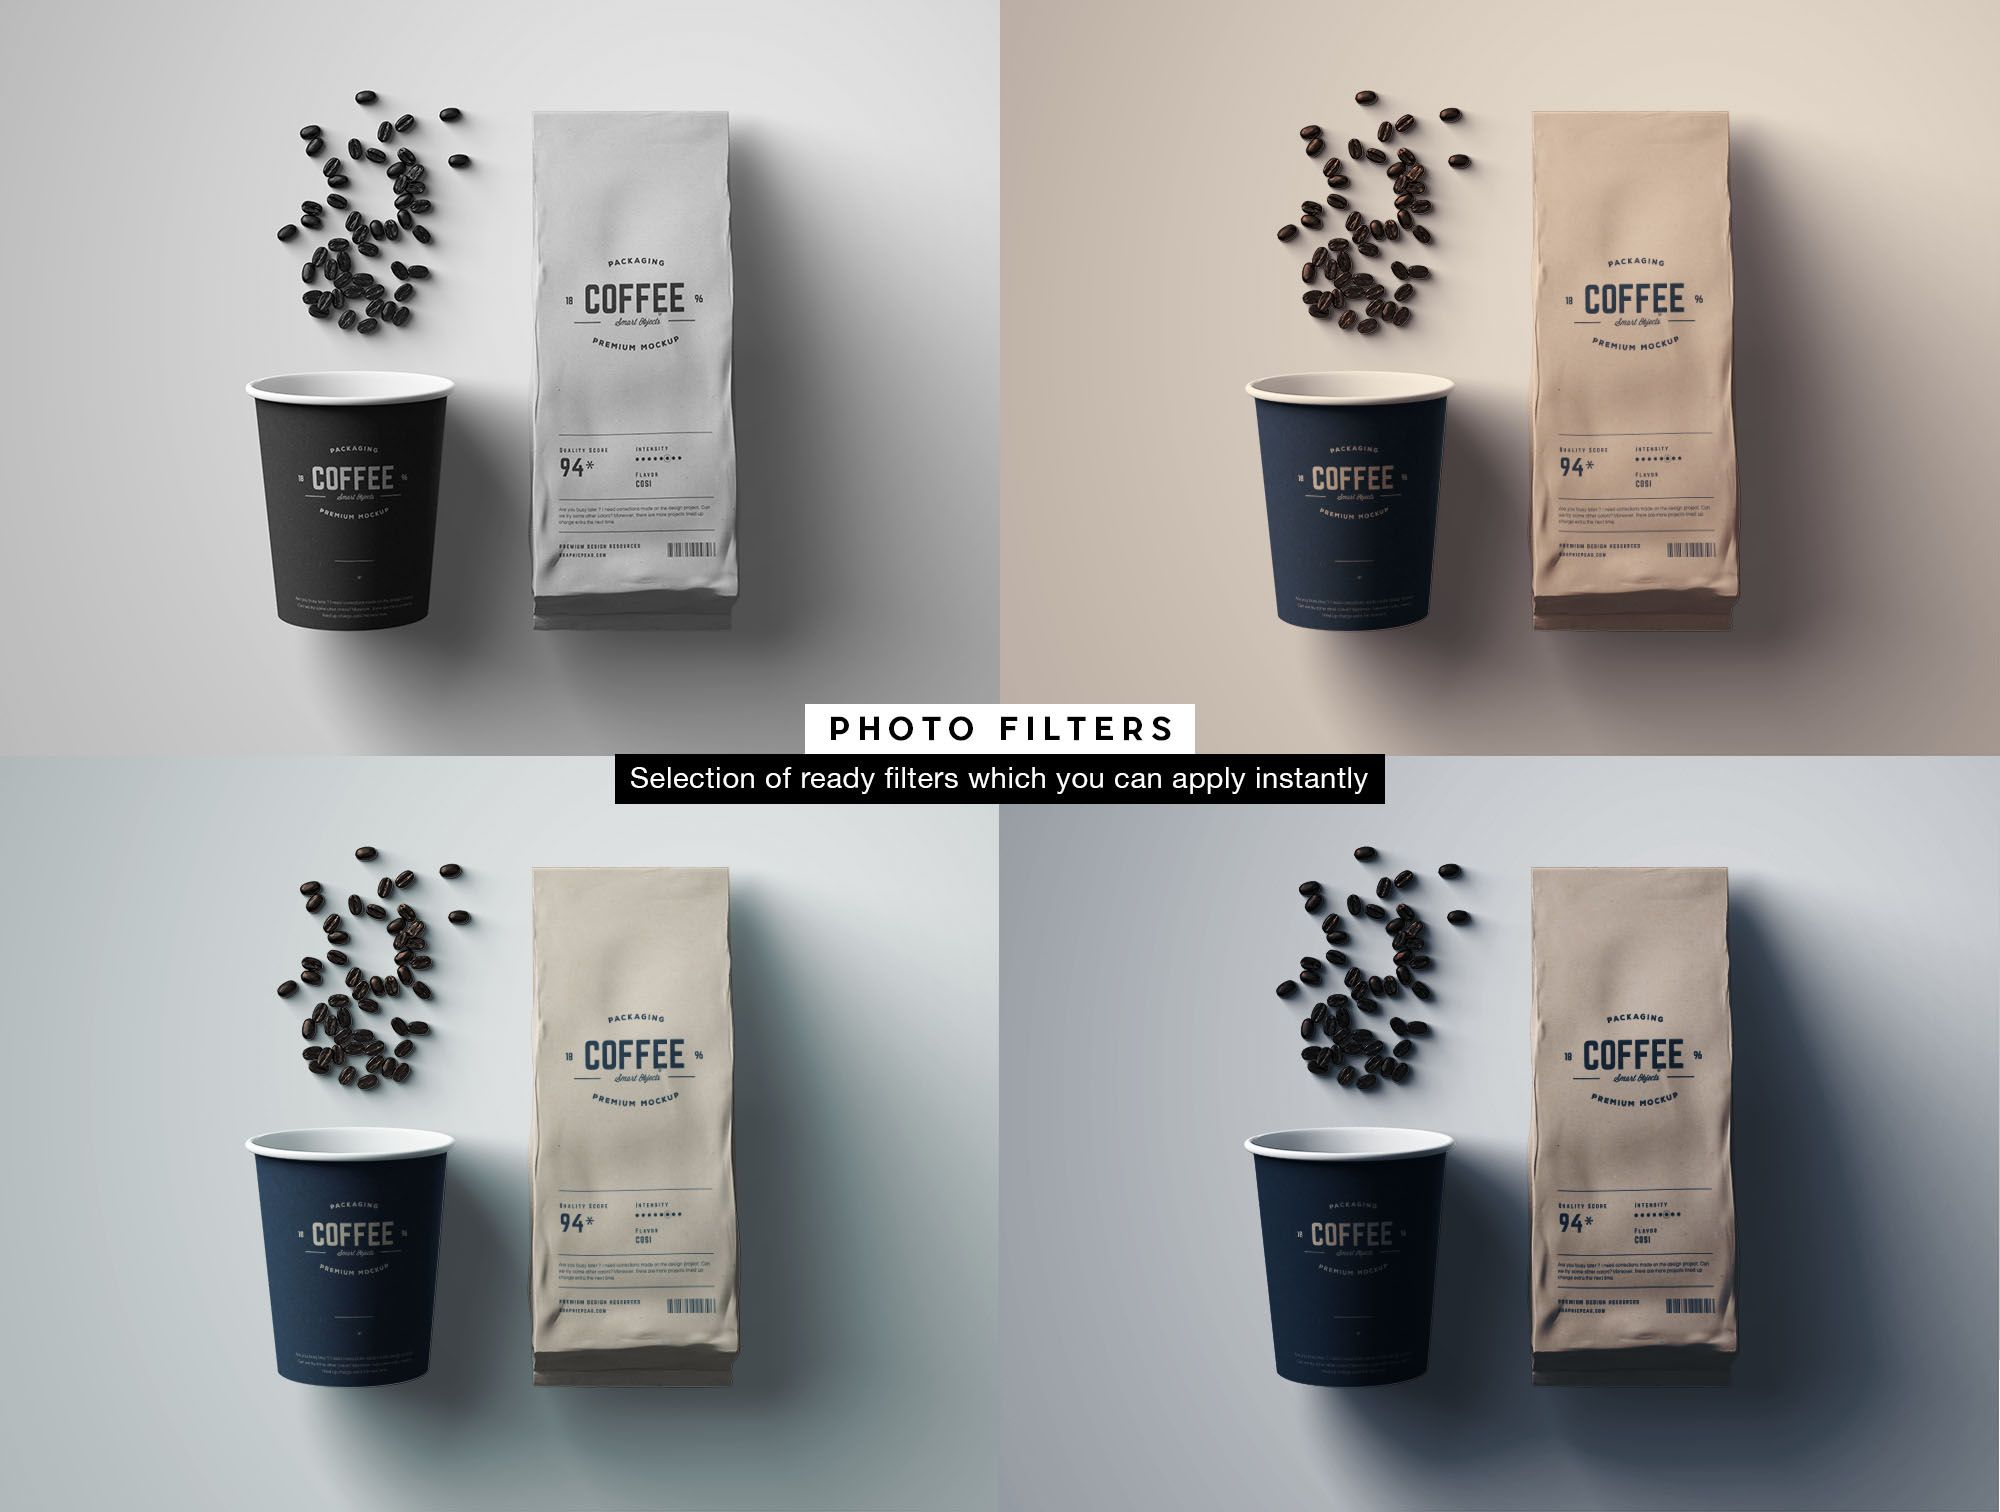 Coffee Package Mockup Filters Coffee Packaging Coffee Coffee Photos